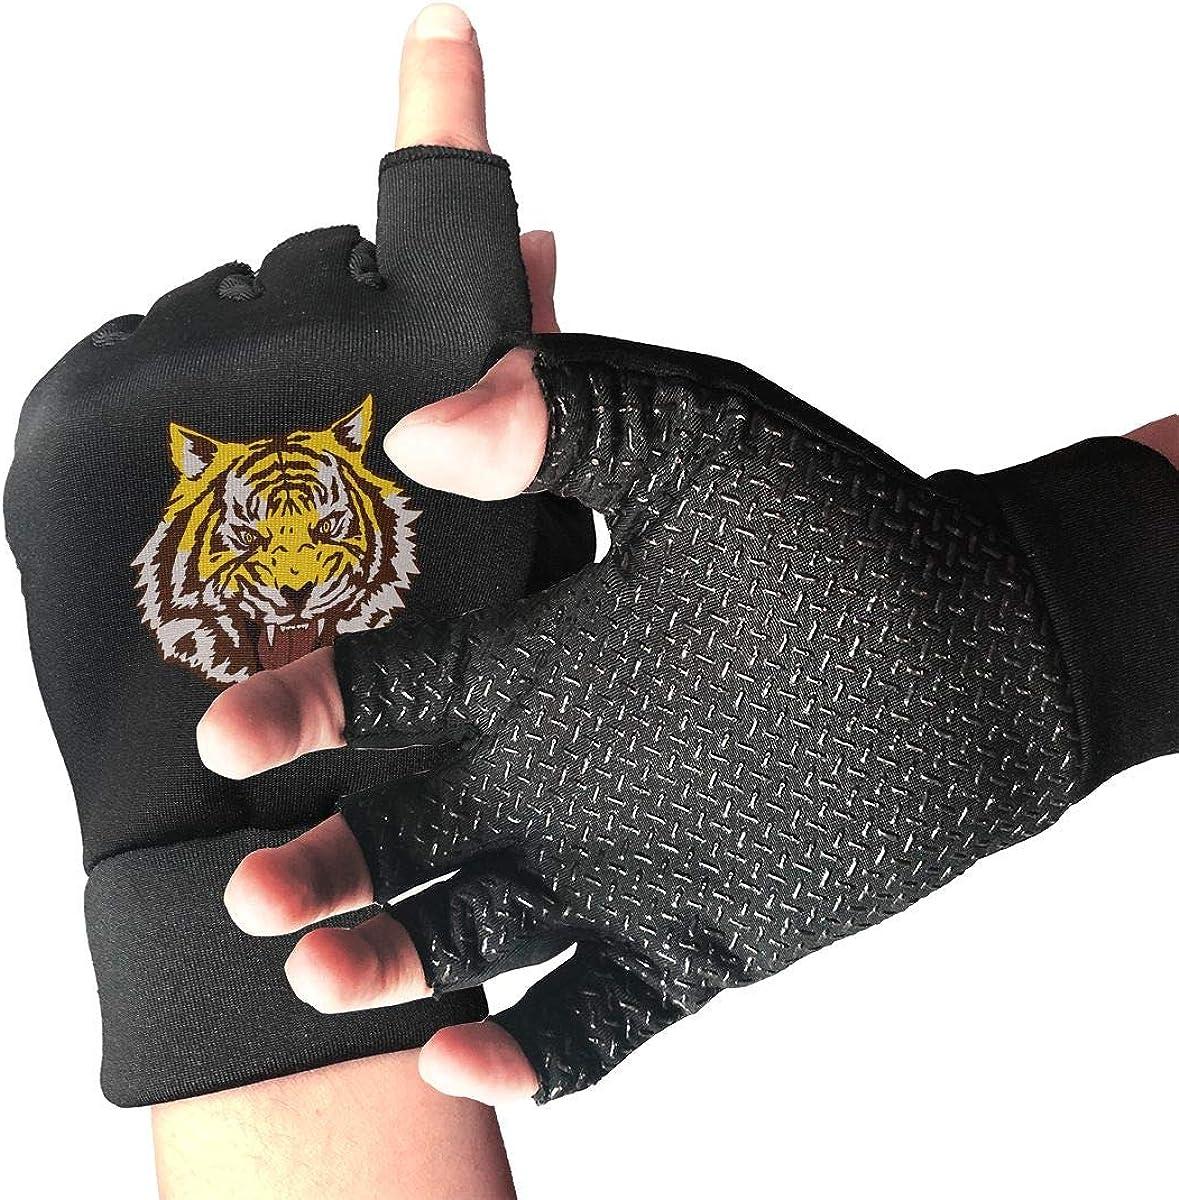 Gloves Yuri Plisetsky Tiger Fingerless Gloves Short Touchscreen Gloves Winter Motorcycle Biker Mitten